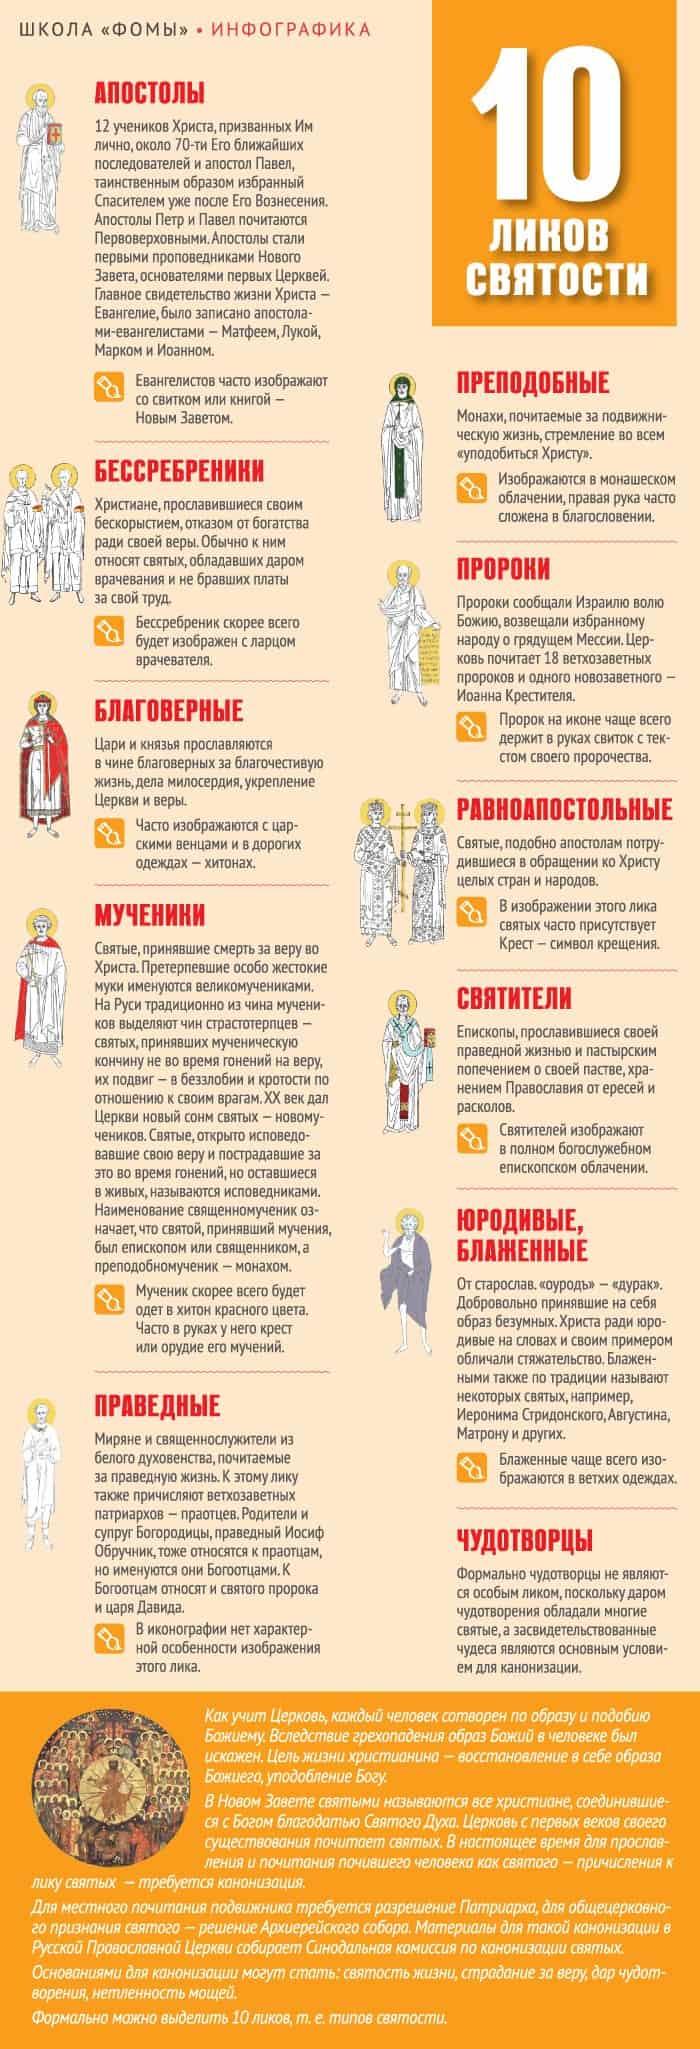 10_likov_small_2